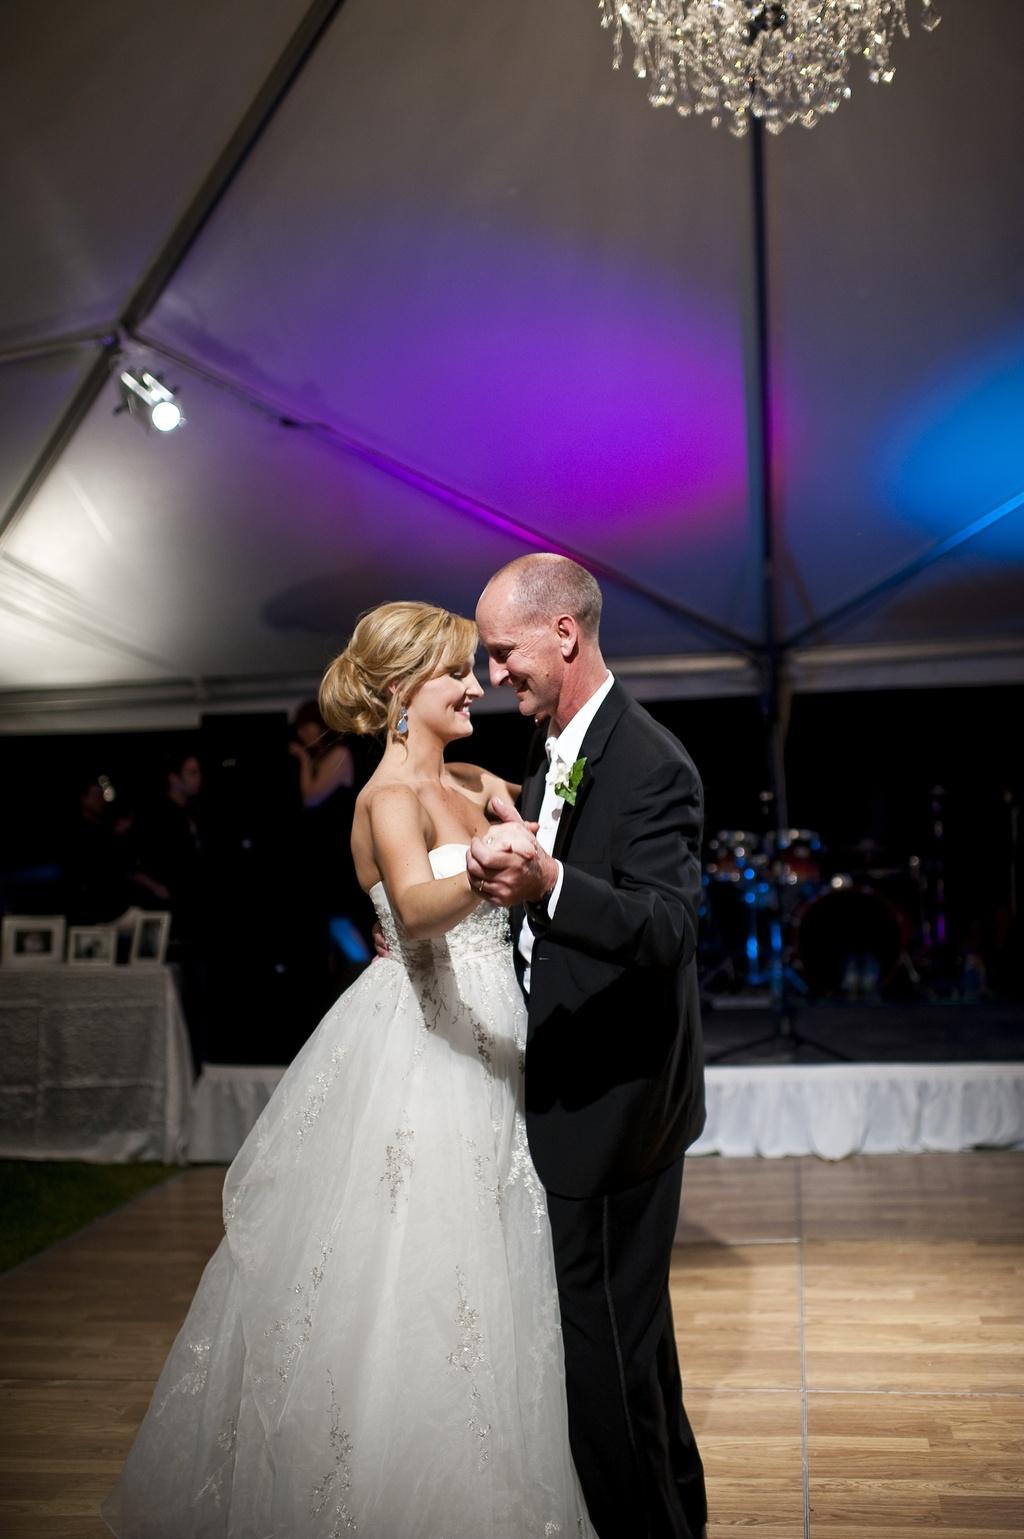 Classic-fall-wedding-bride-groom-first-dance.full